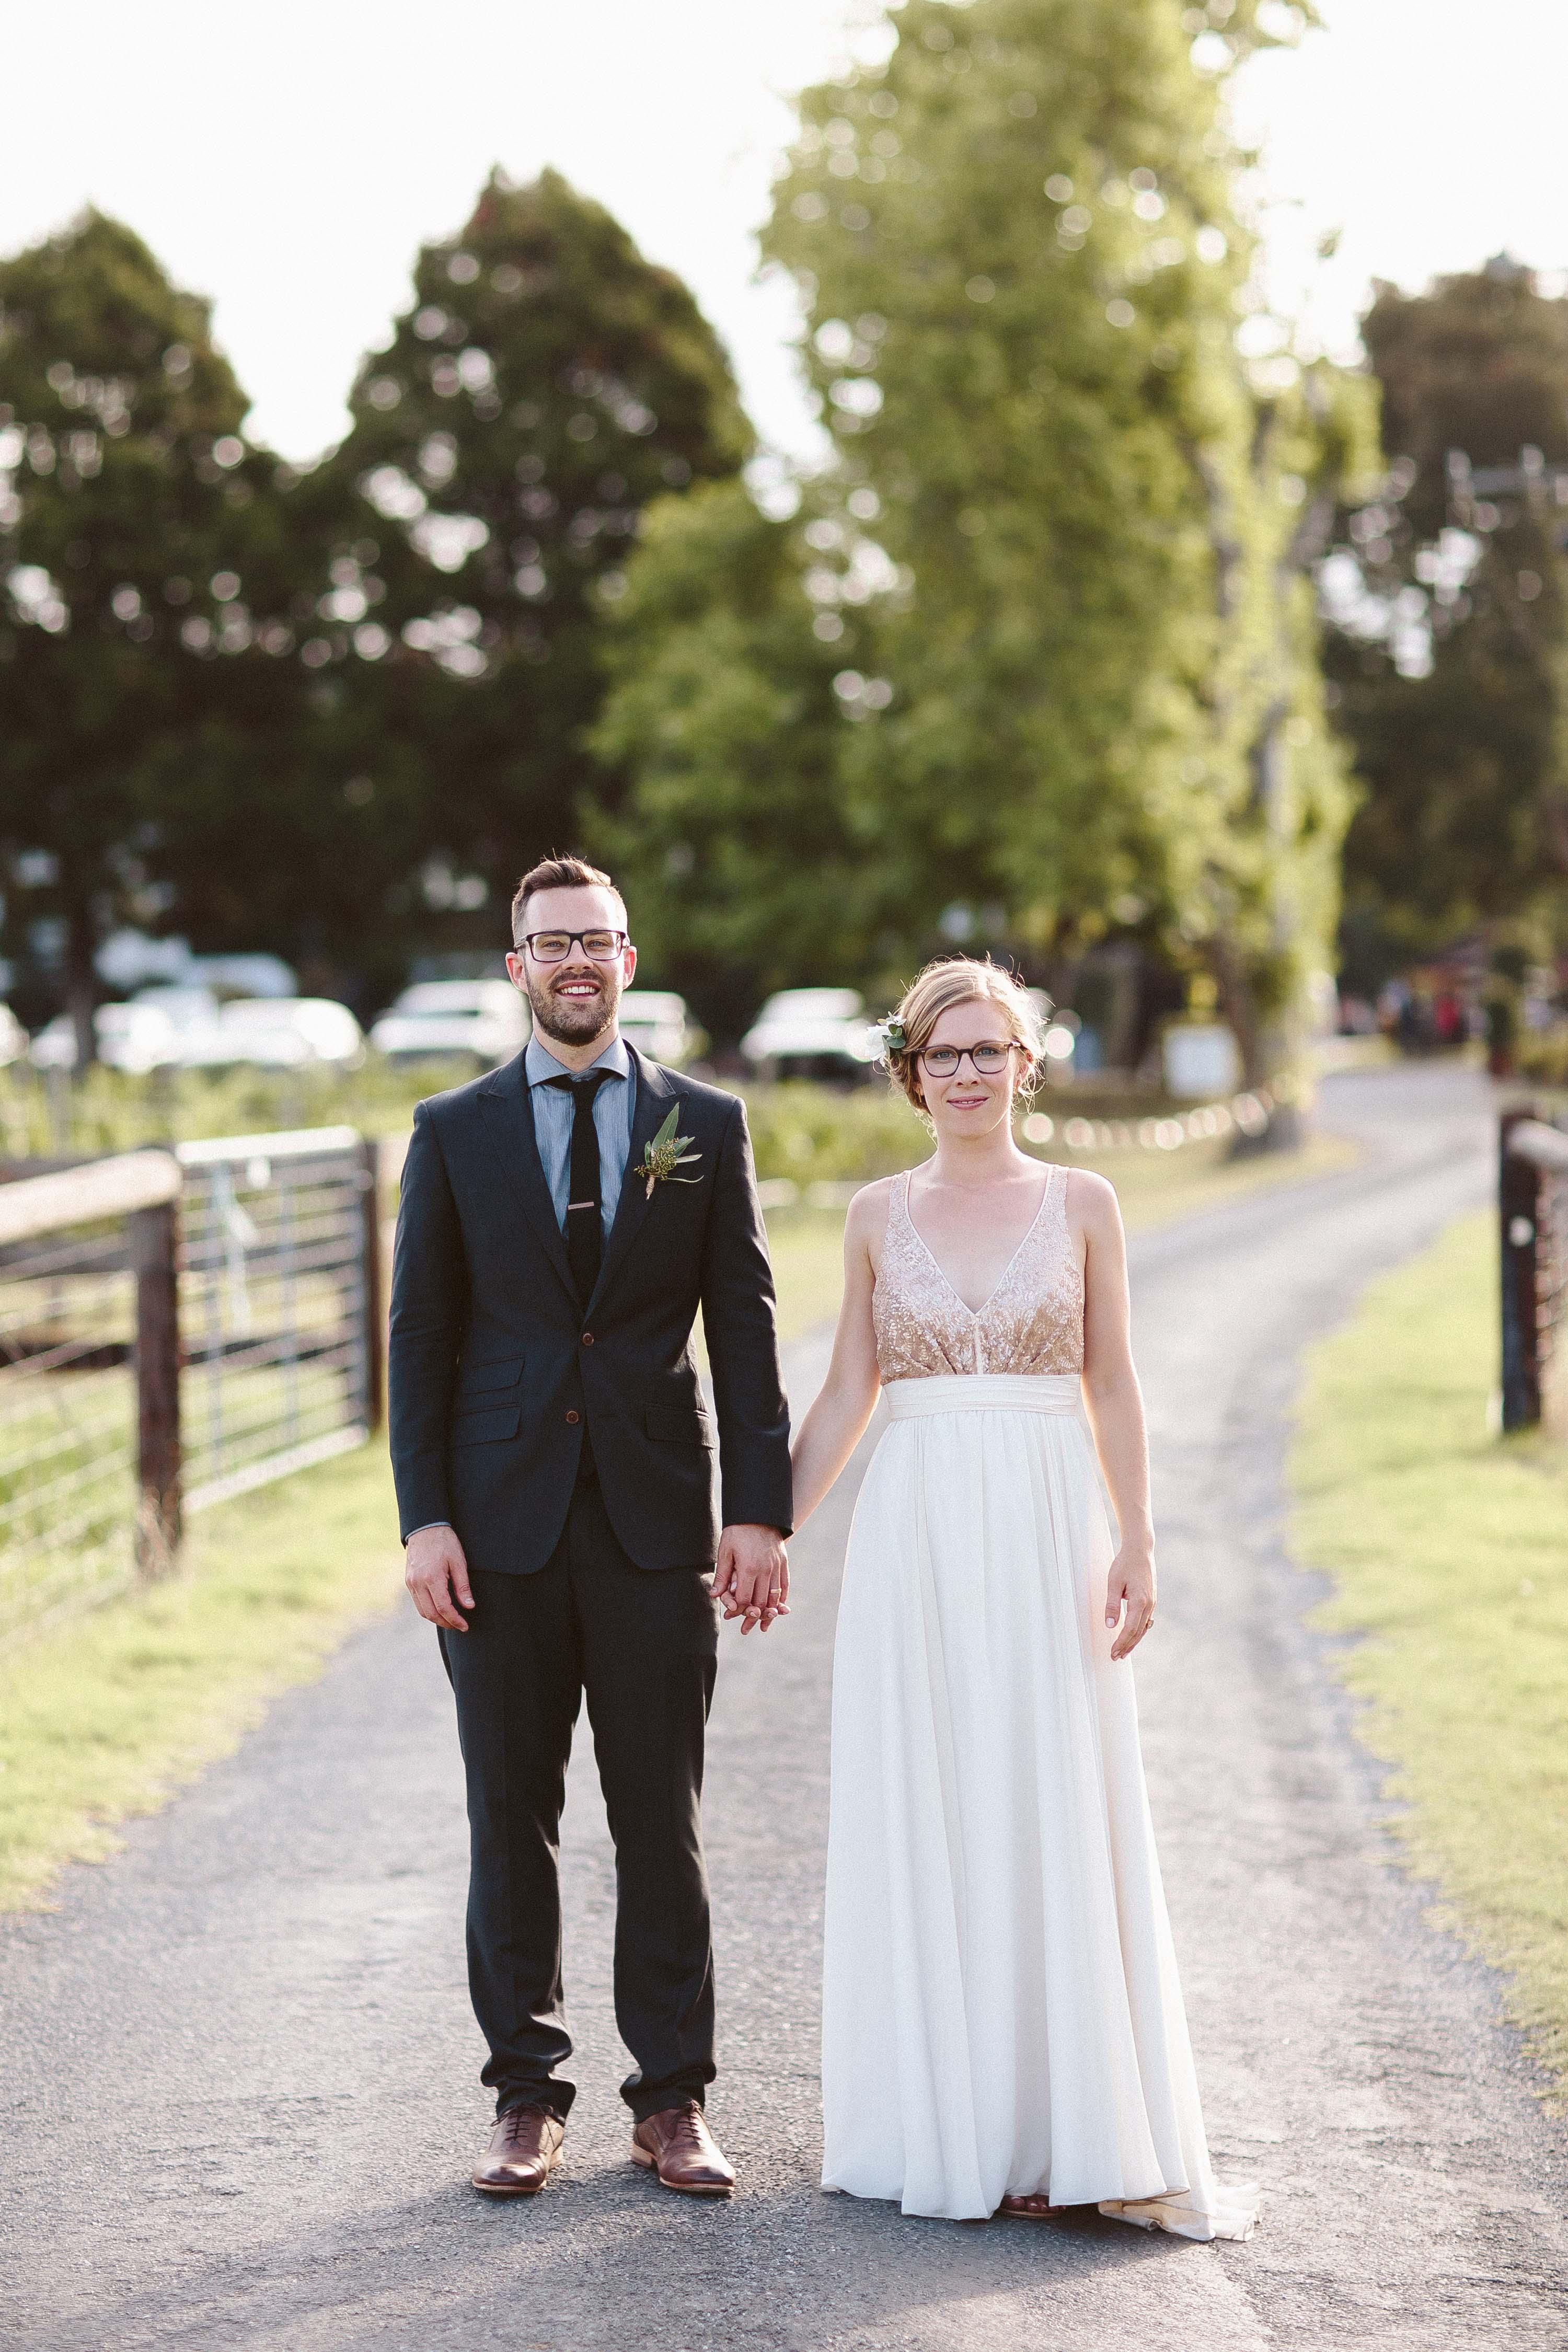 elise&liam-wedding-sonjacphotography-highres-831